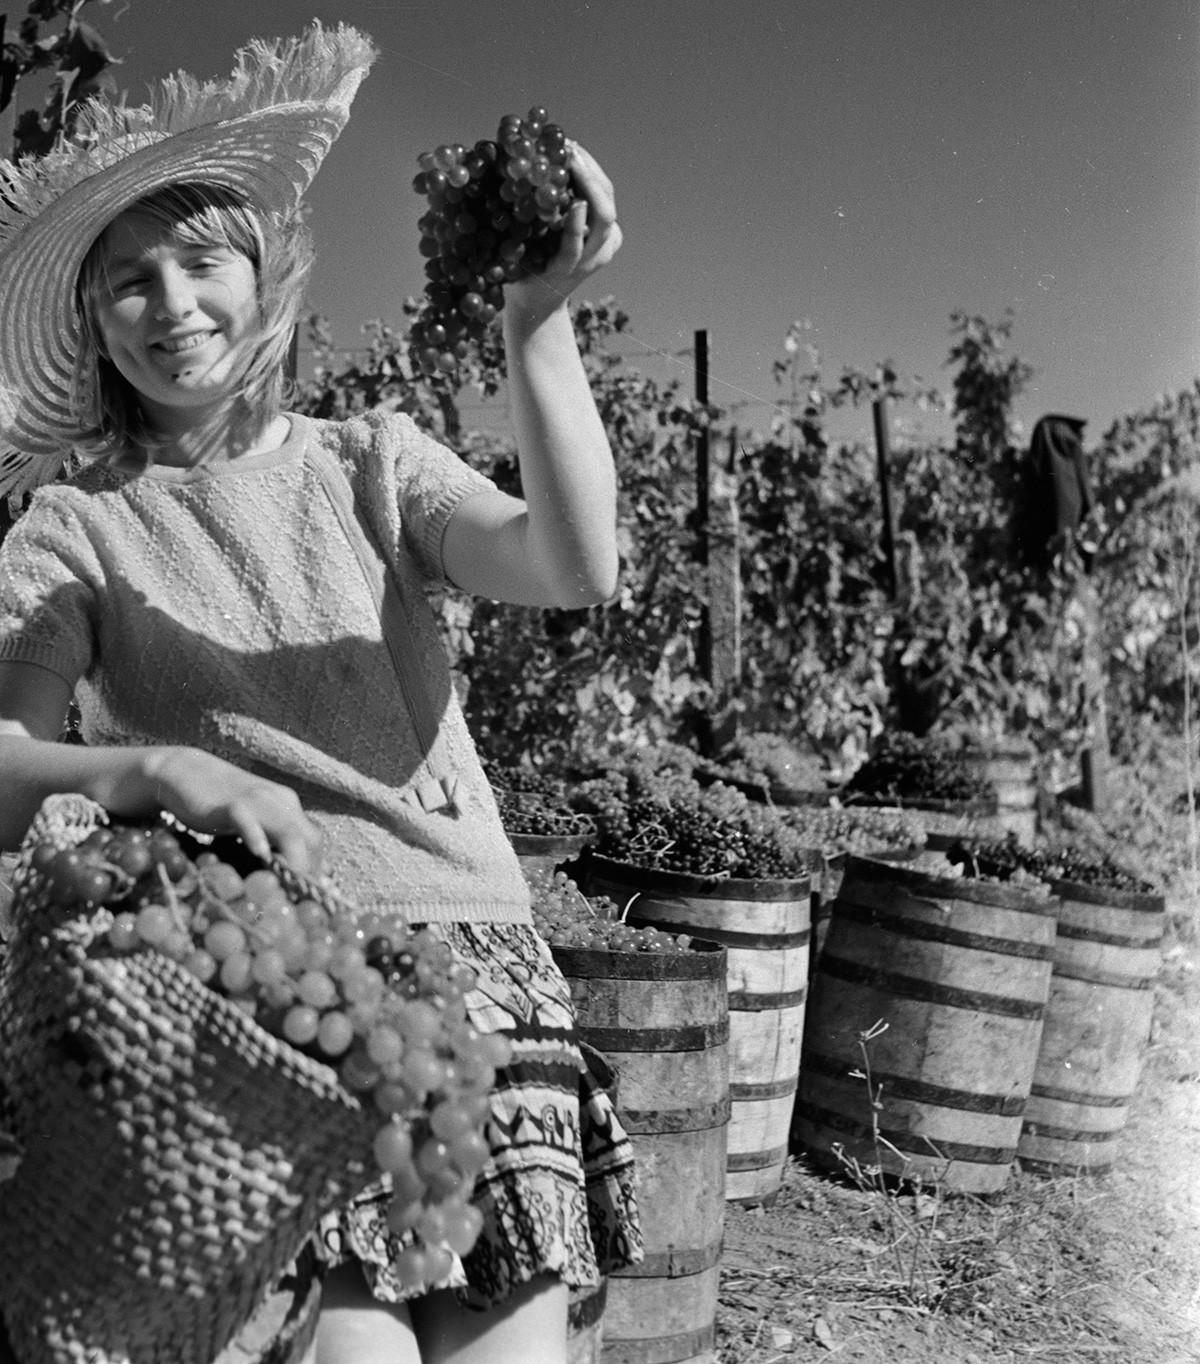 Cosecha de uva en Crimea, 1970.